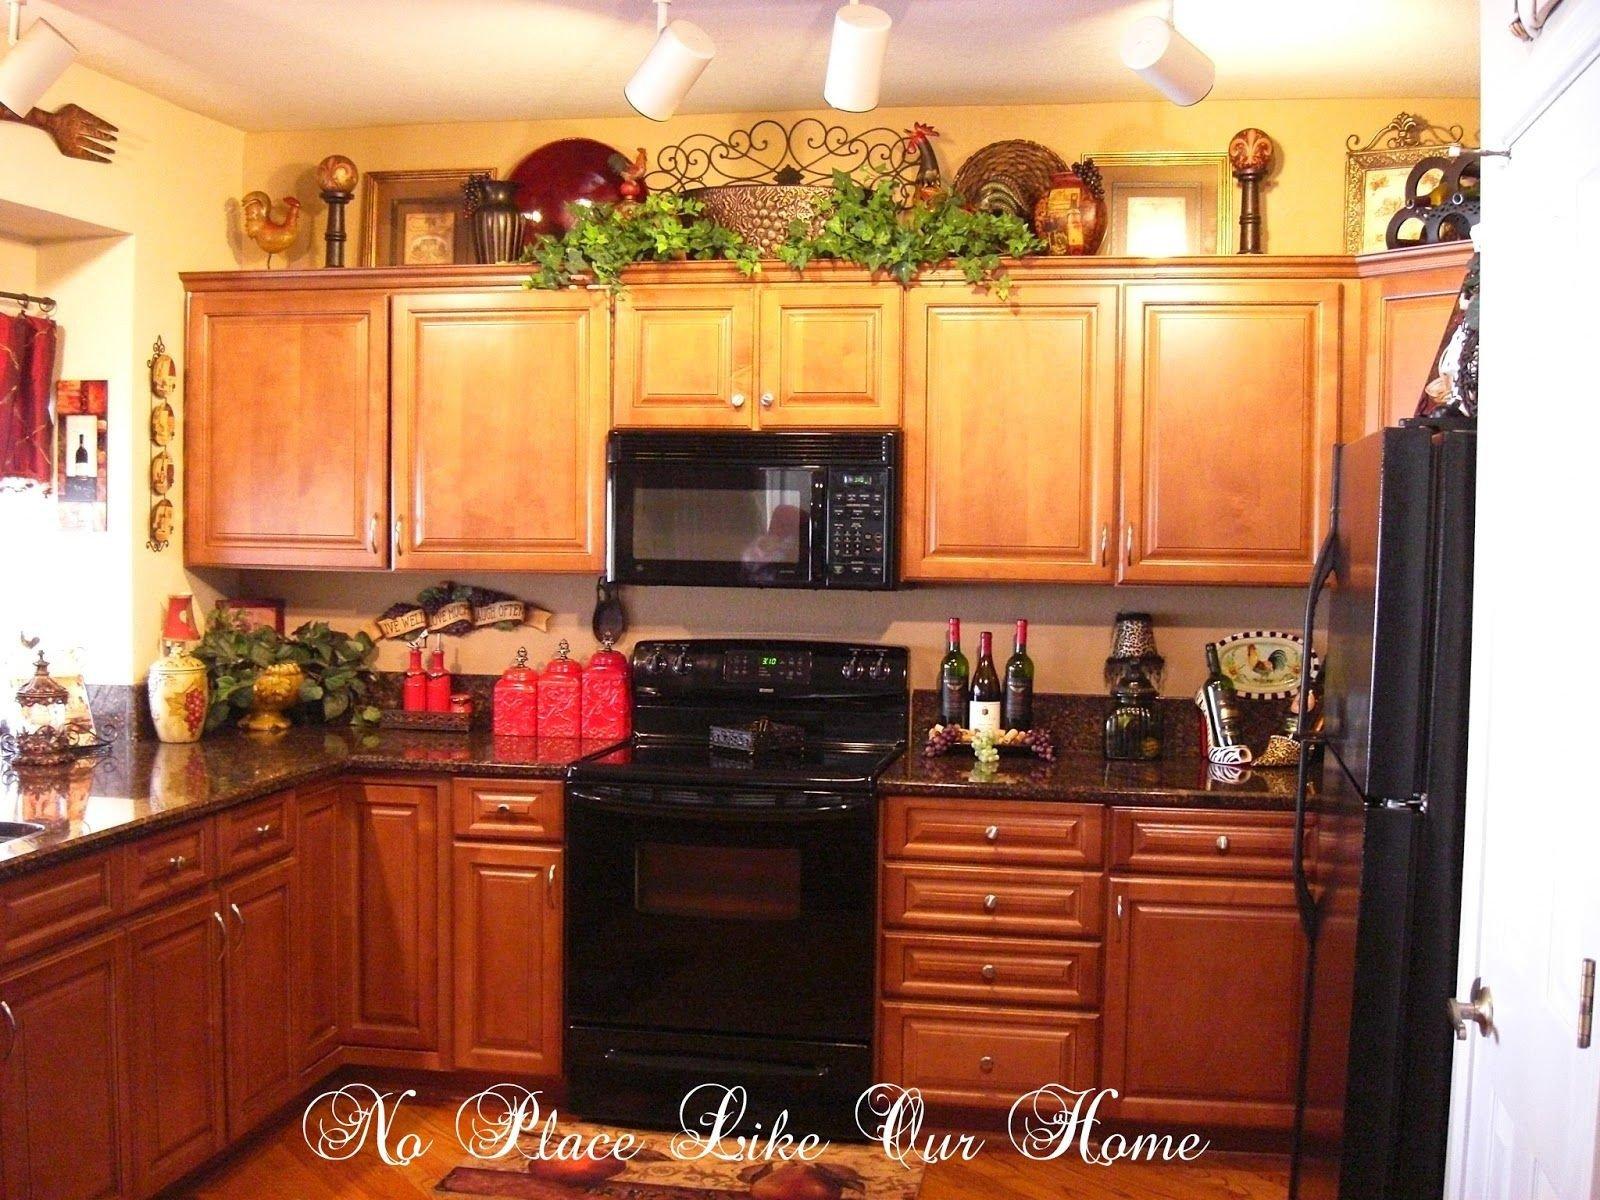 Top Of Kitchen Cabinet Decor Elegant Pin On Kitchen Ideas